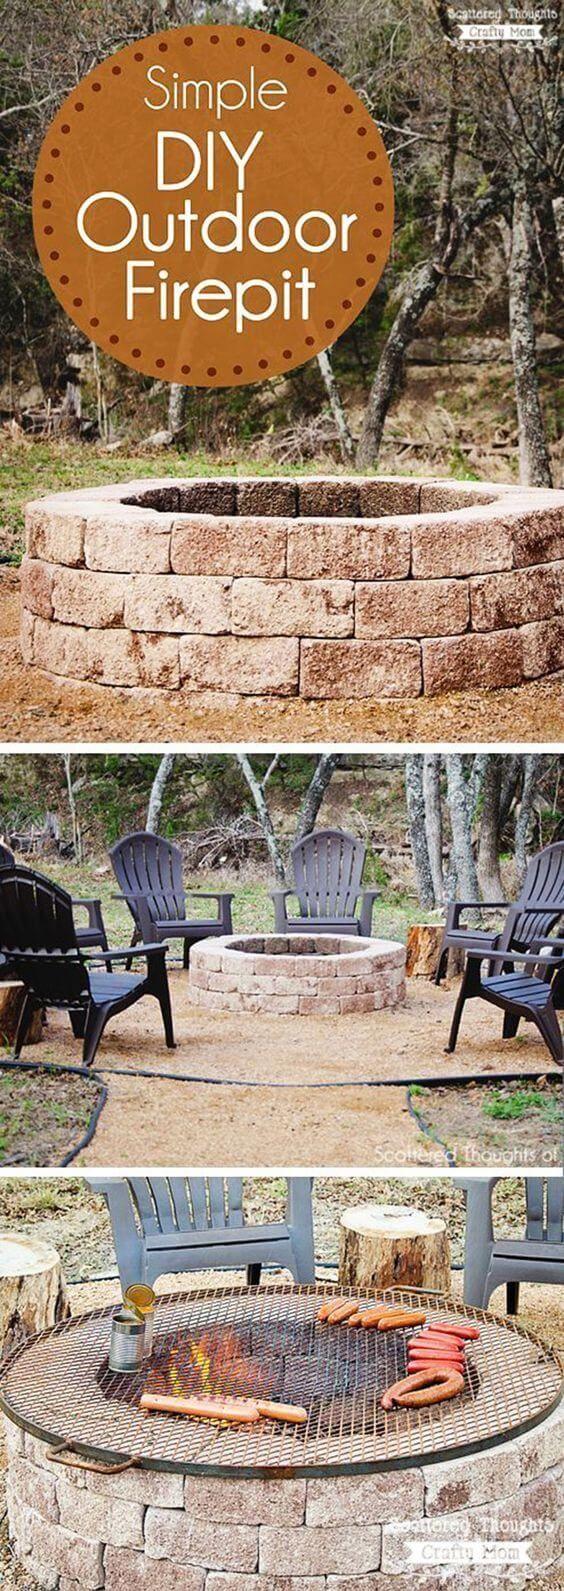 Simple+DIY+Round+Stone+Firepit